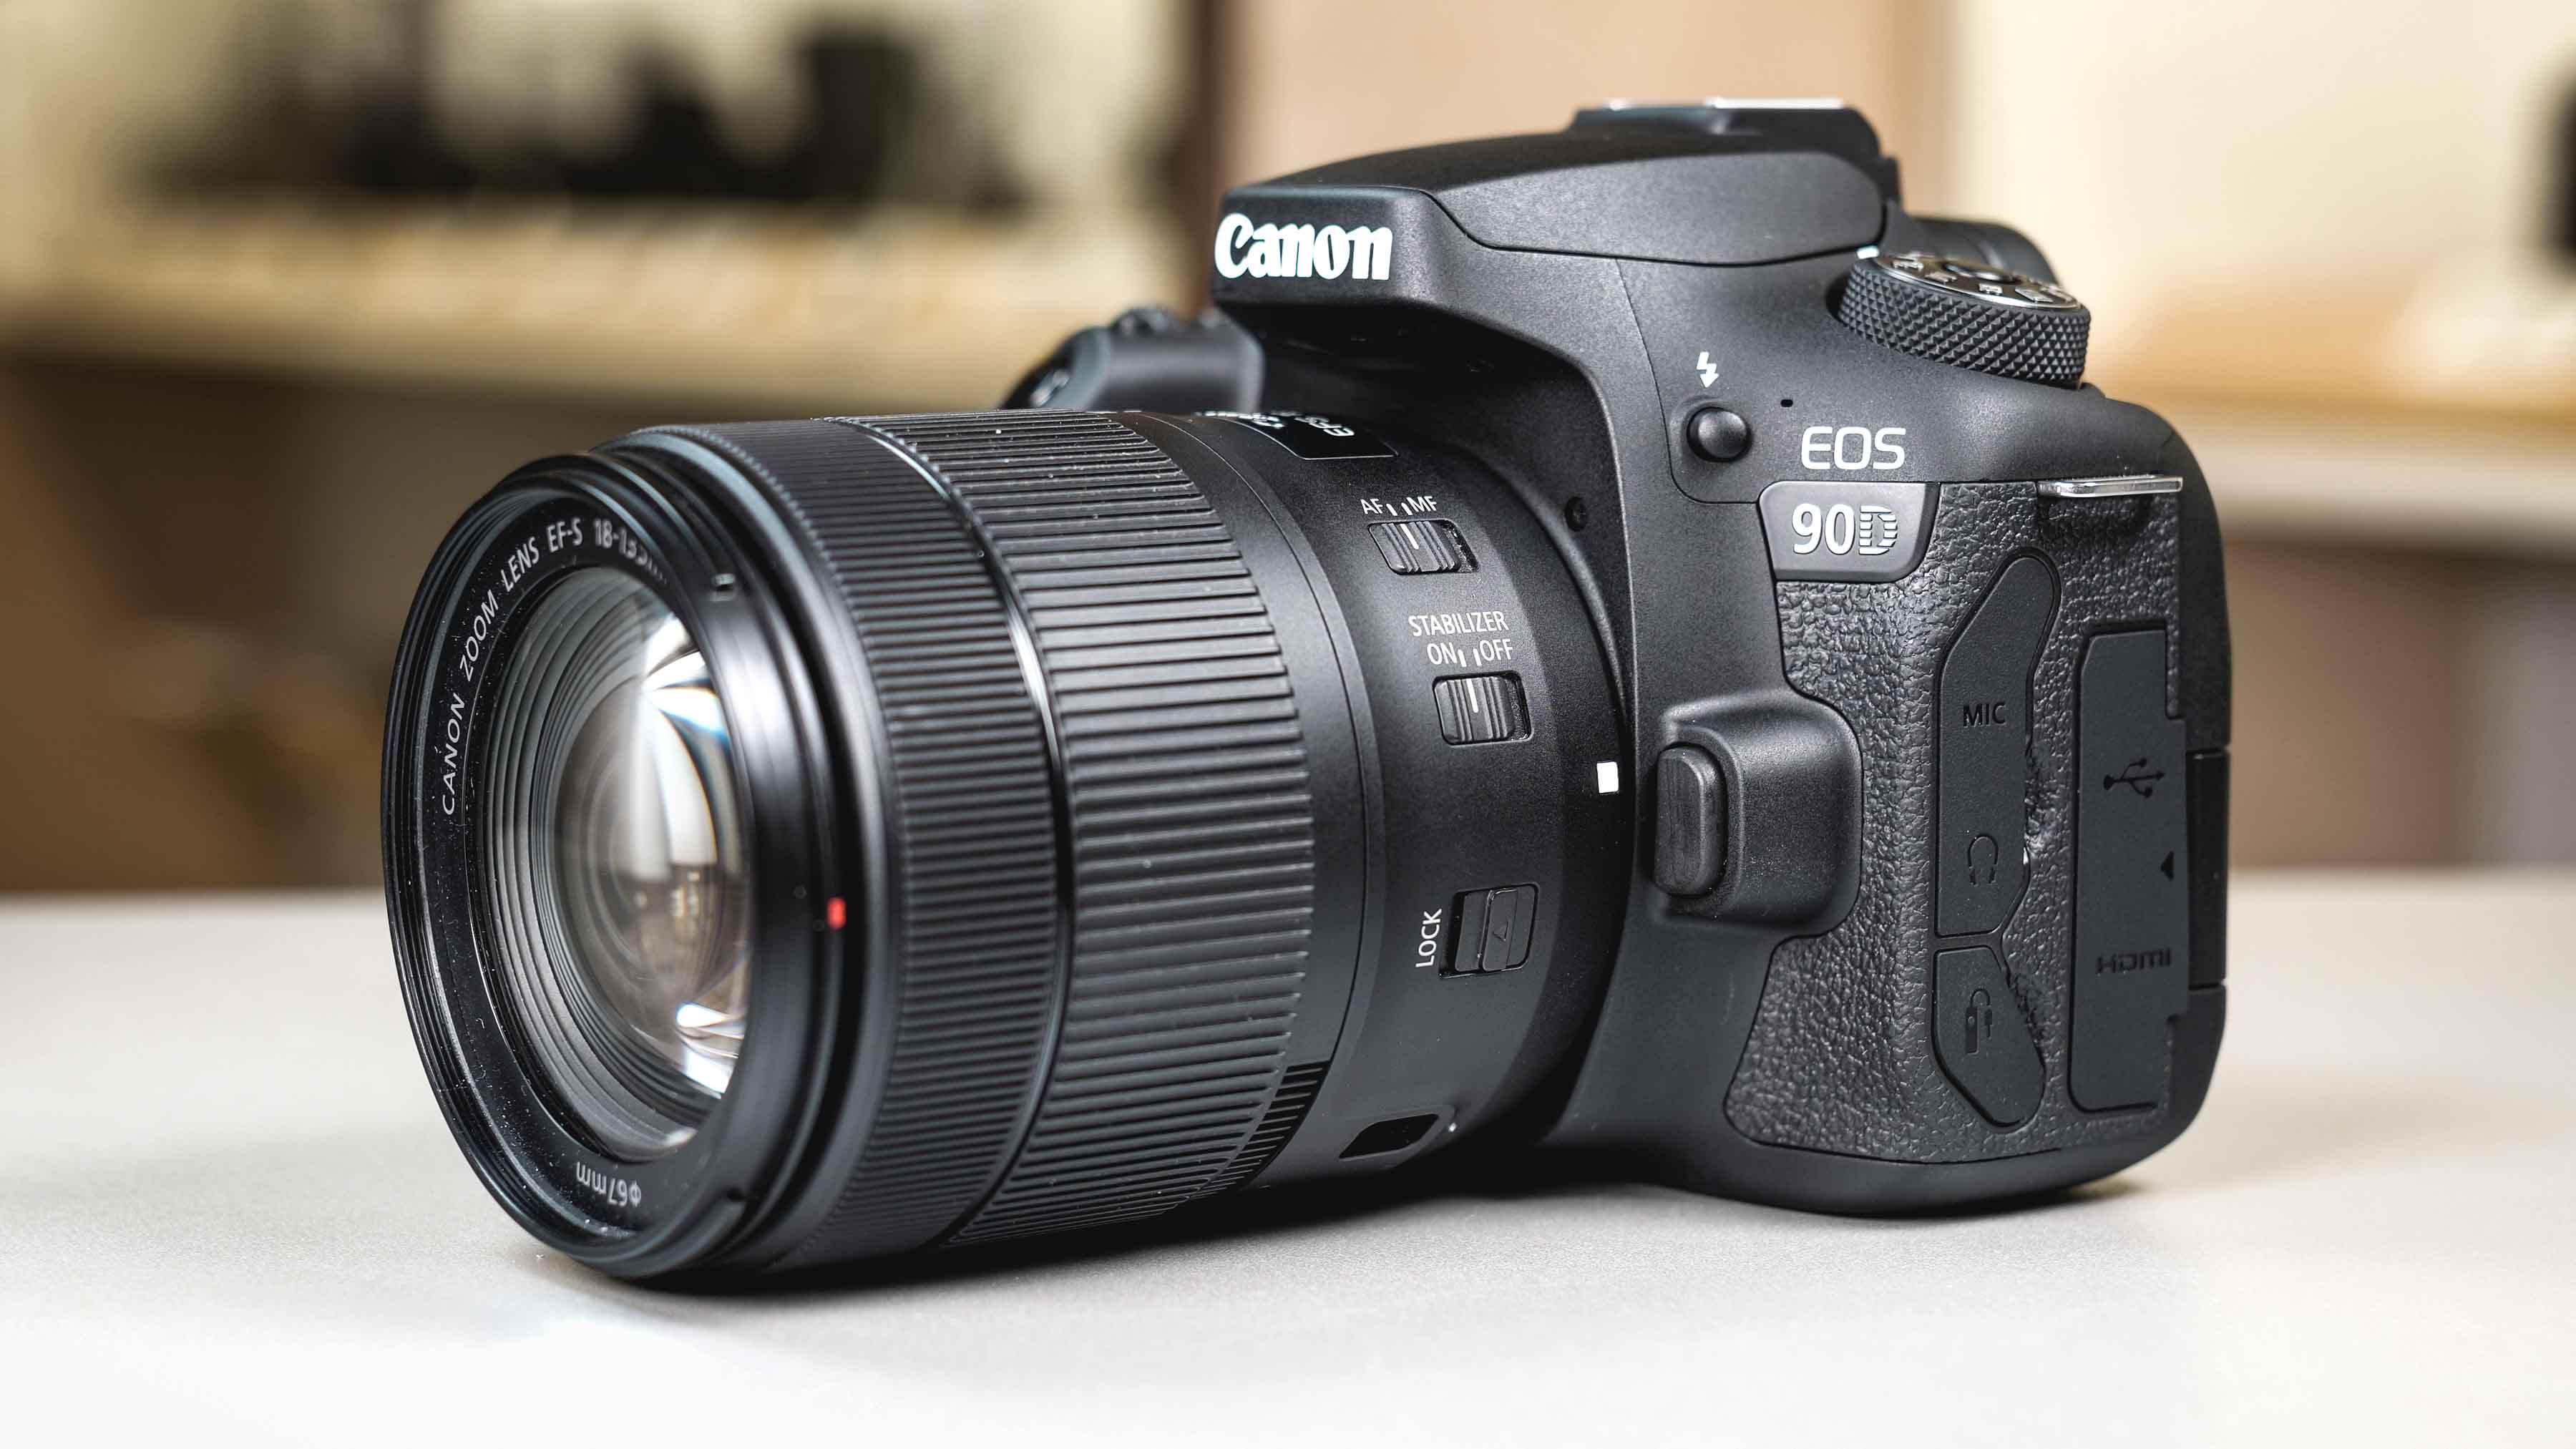 Canon EOS 90D vs 80D